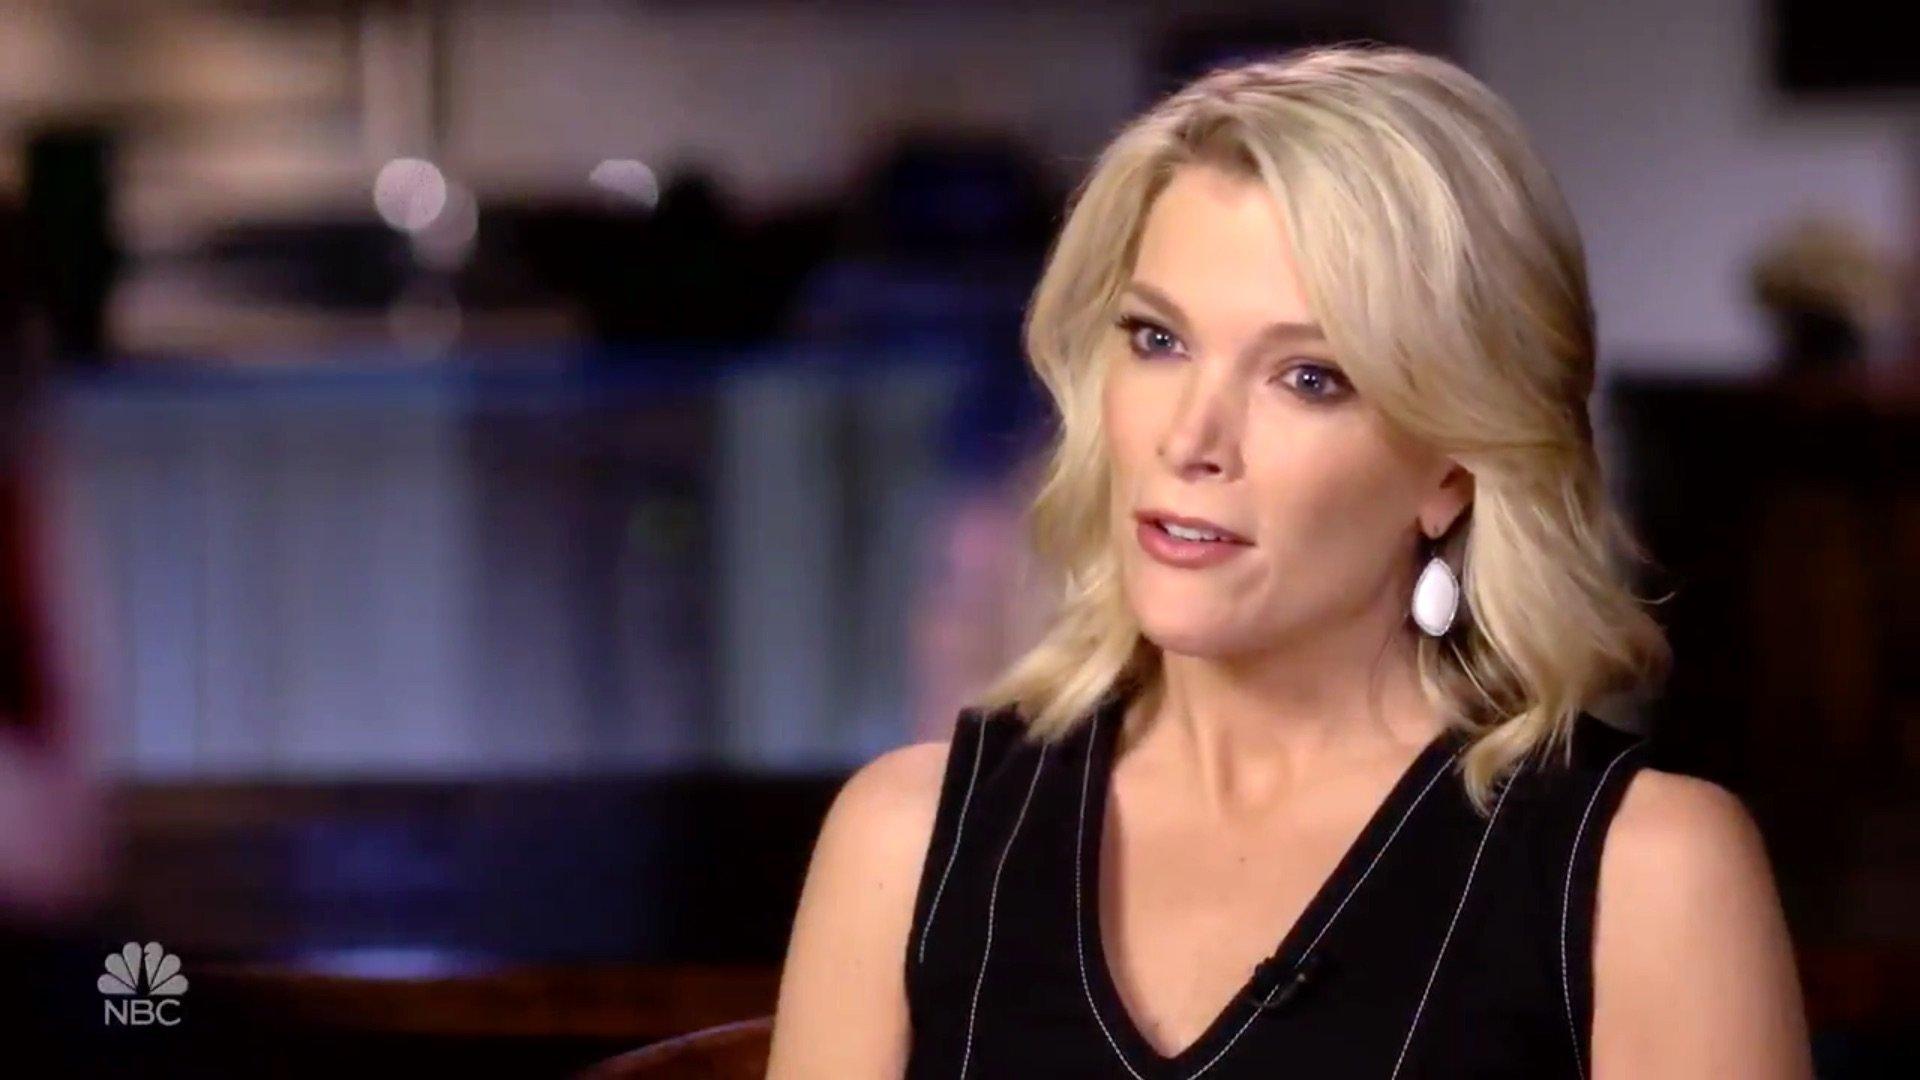 Megyn Kelly, NBC Under Fire Over 'Sickening' Alex Jones